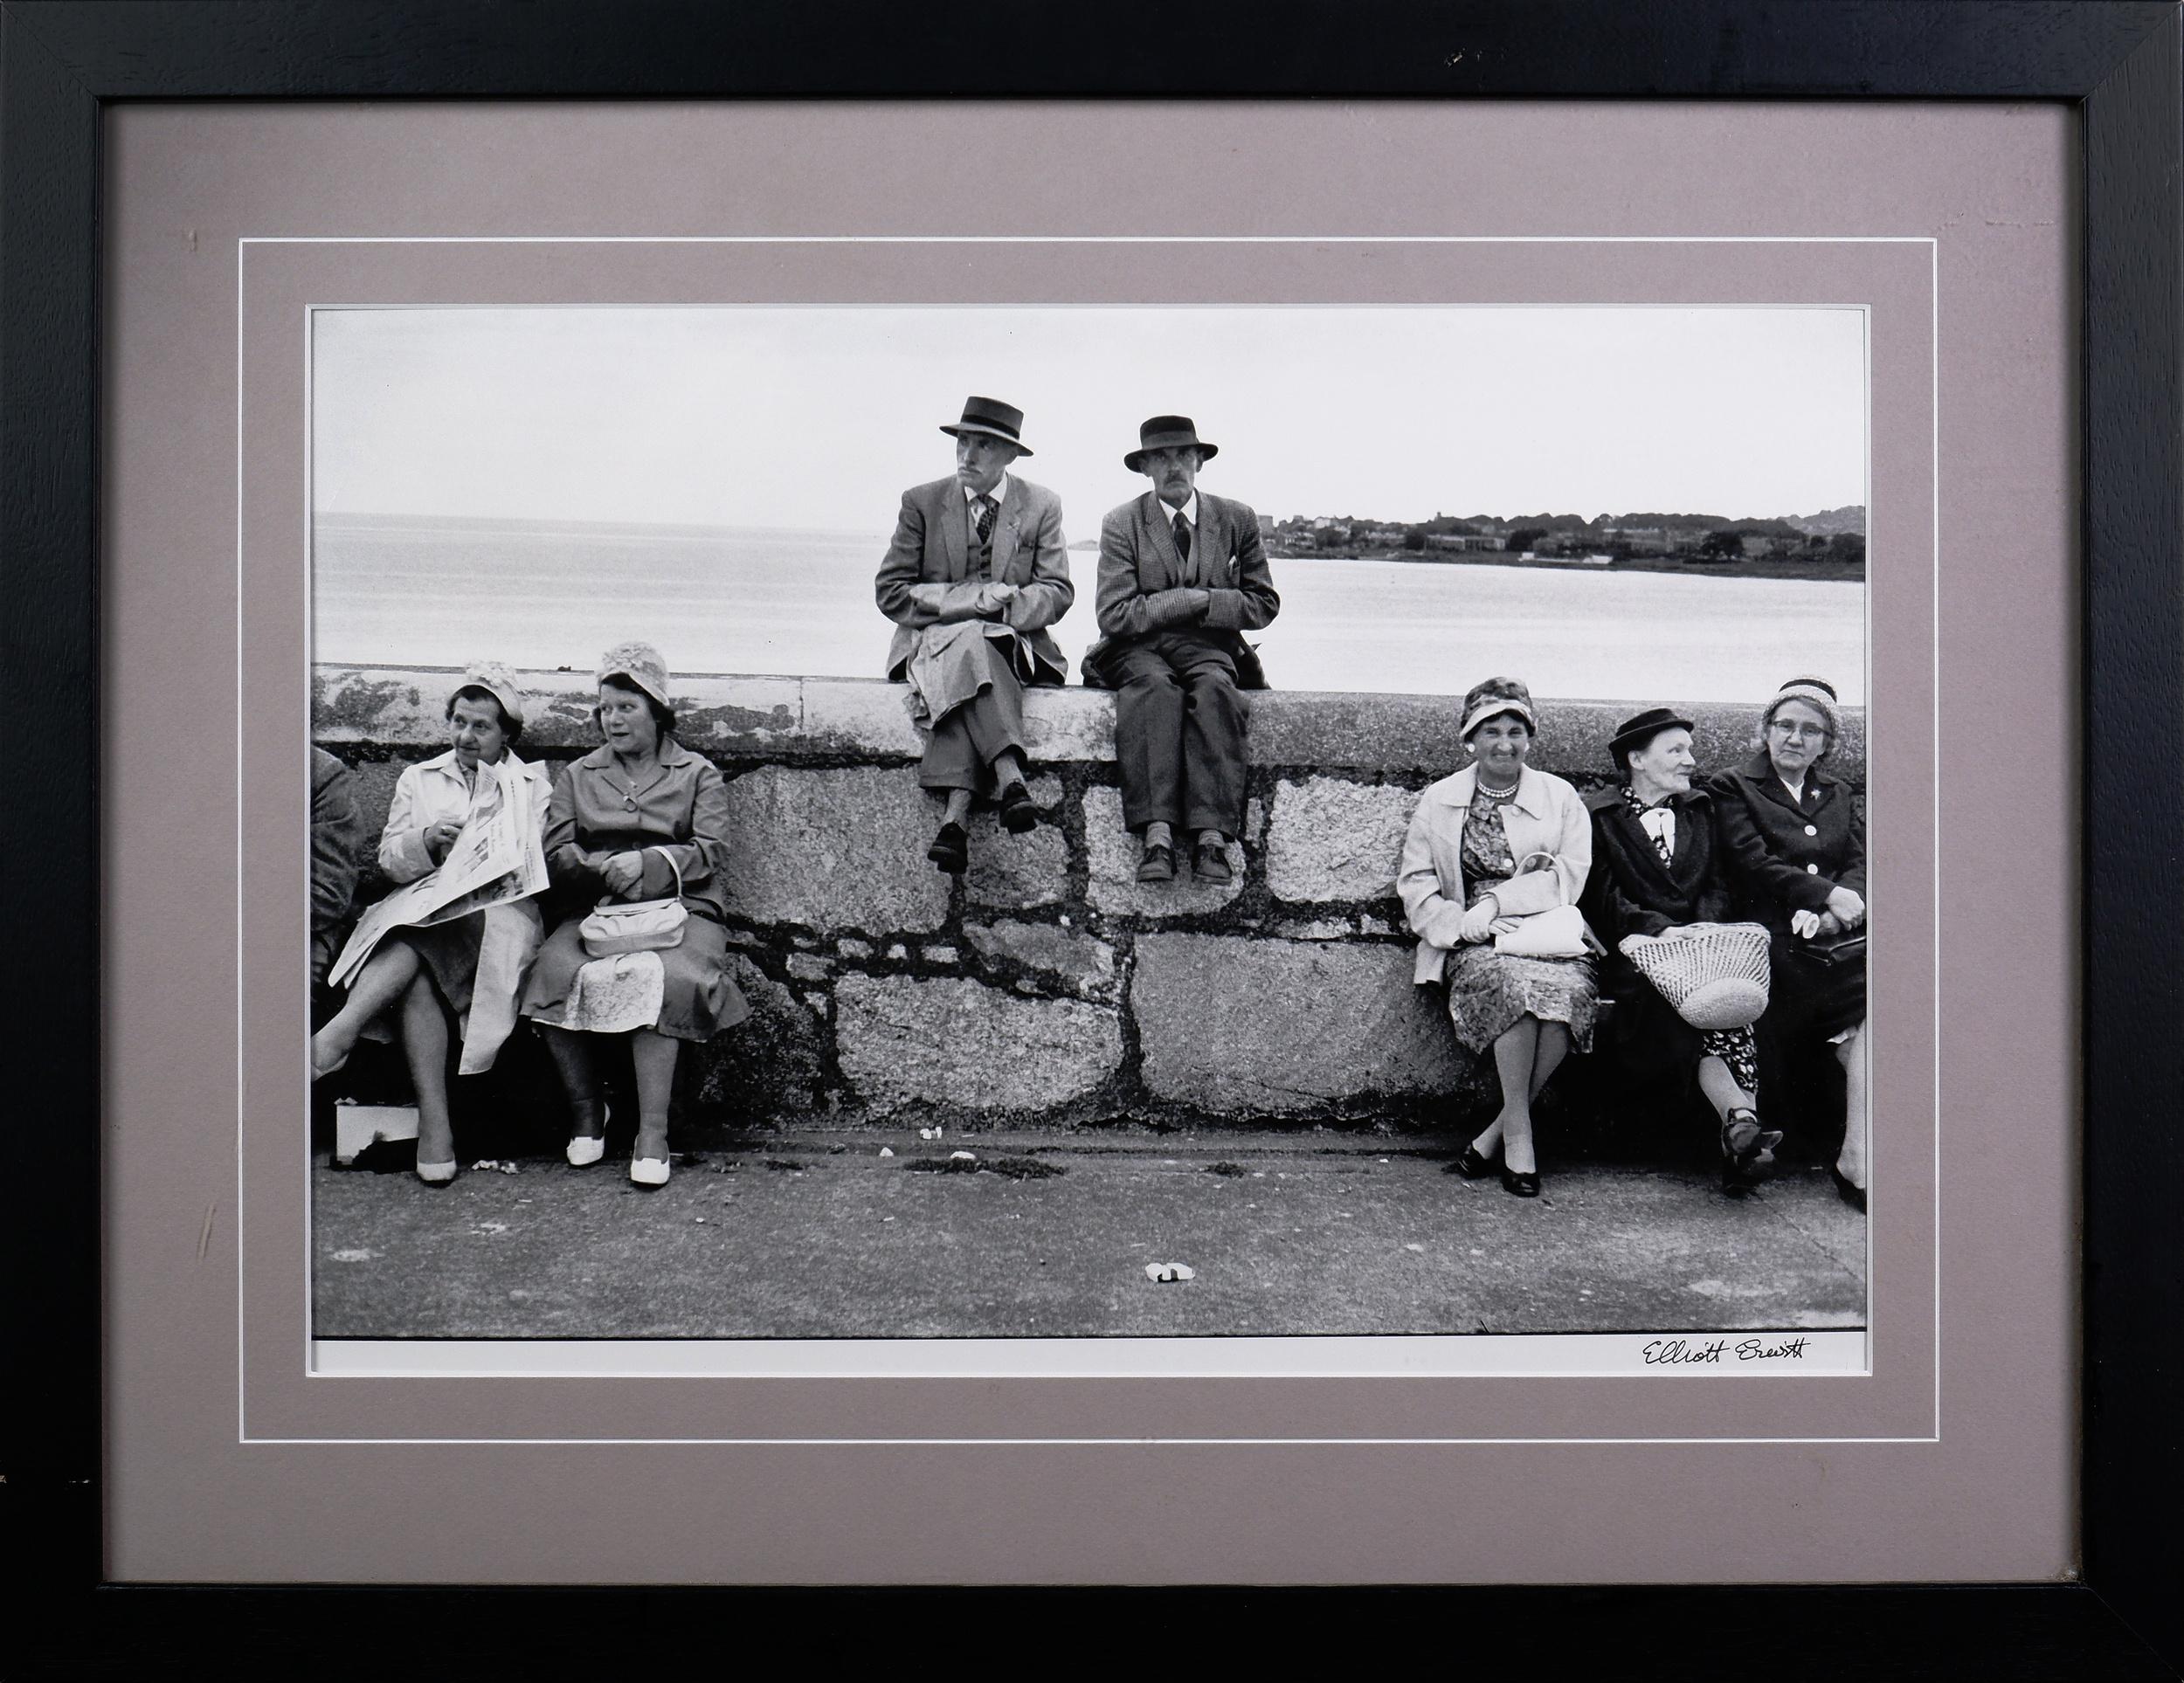 'Elliott Erwitt (born 1928, French/American), Dun Laoghaire, Ireland 1962, Black and White Photograph'